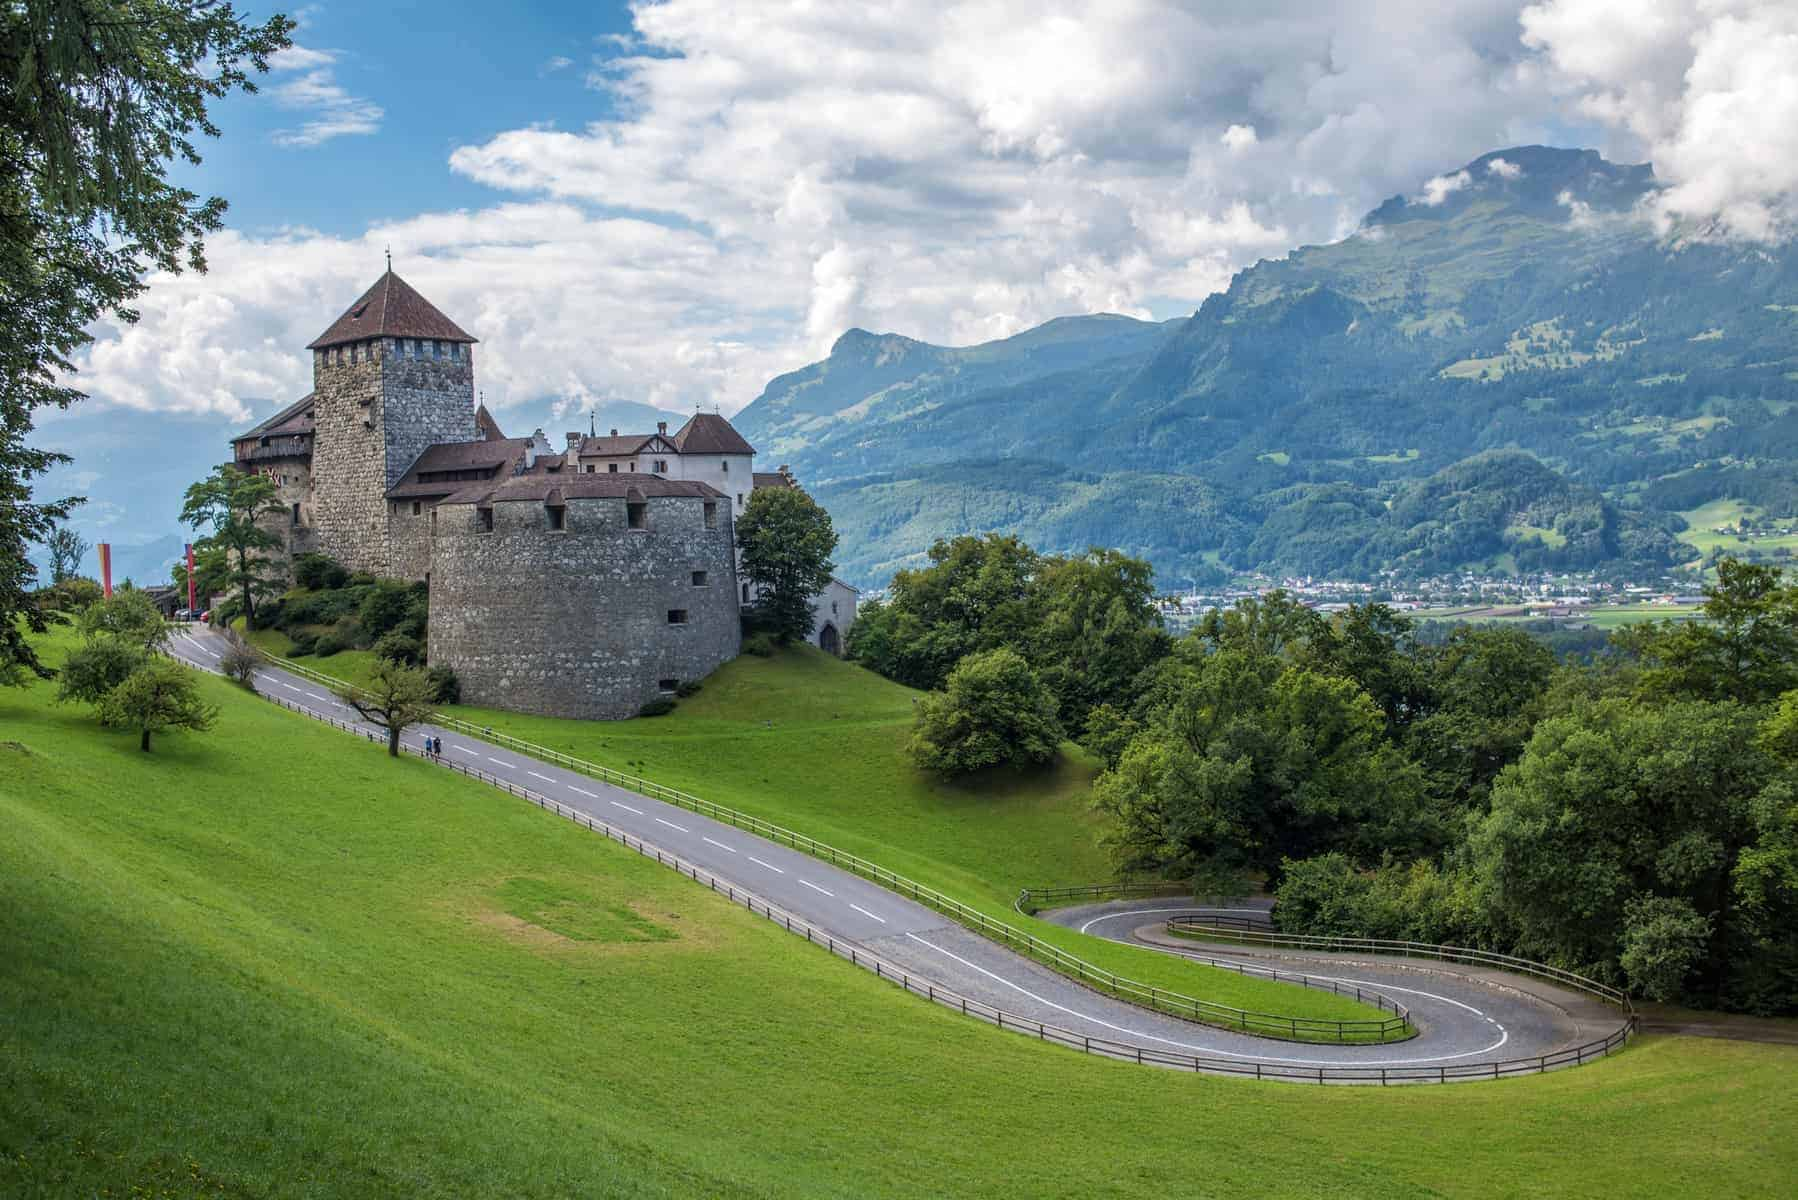 Vaduz Castle, the palace of the Liechtenstein Prince